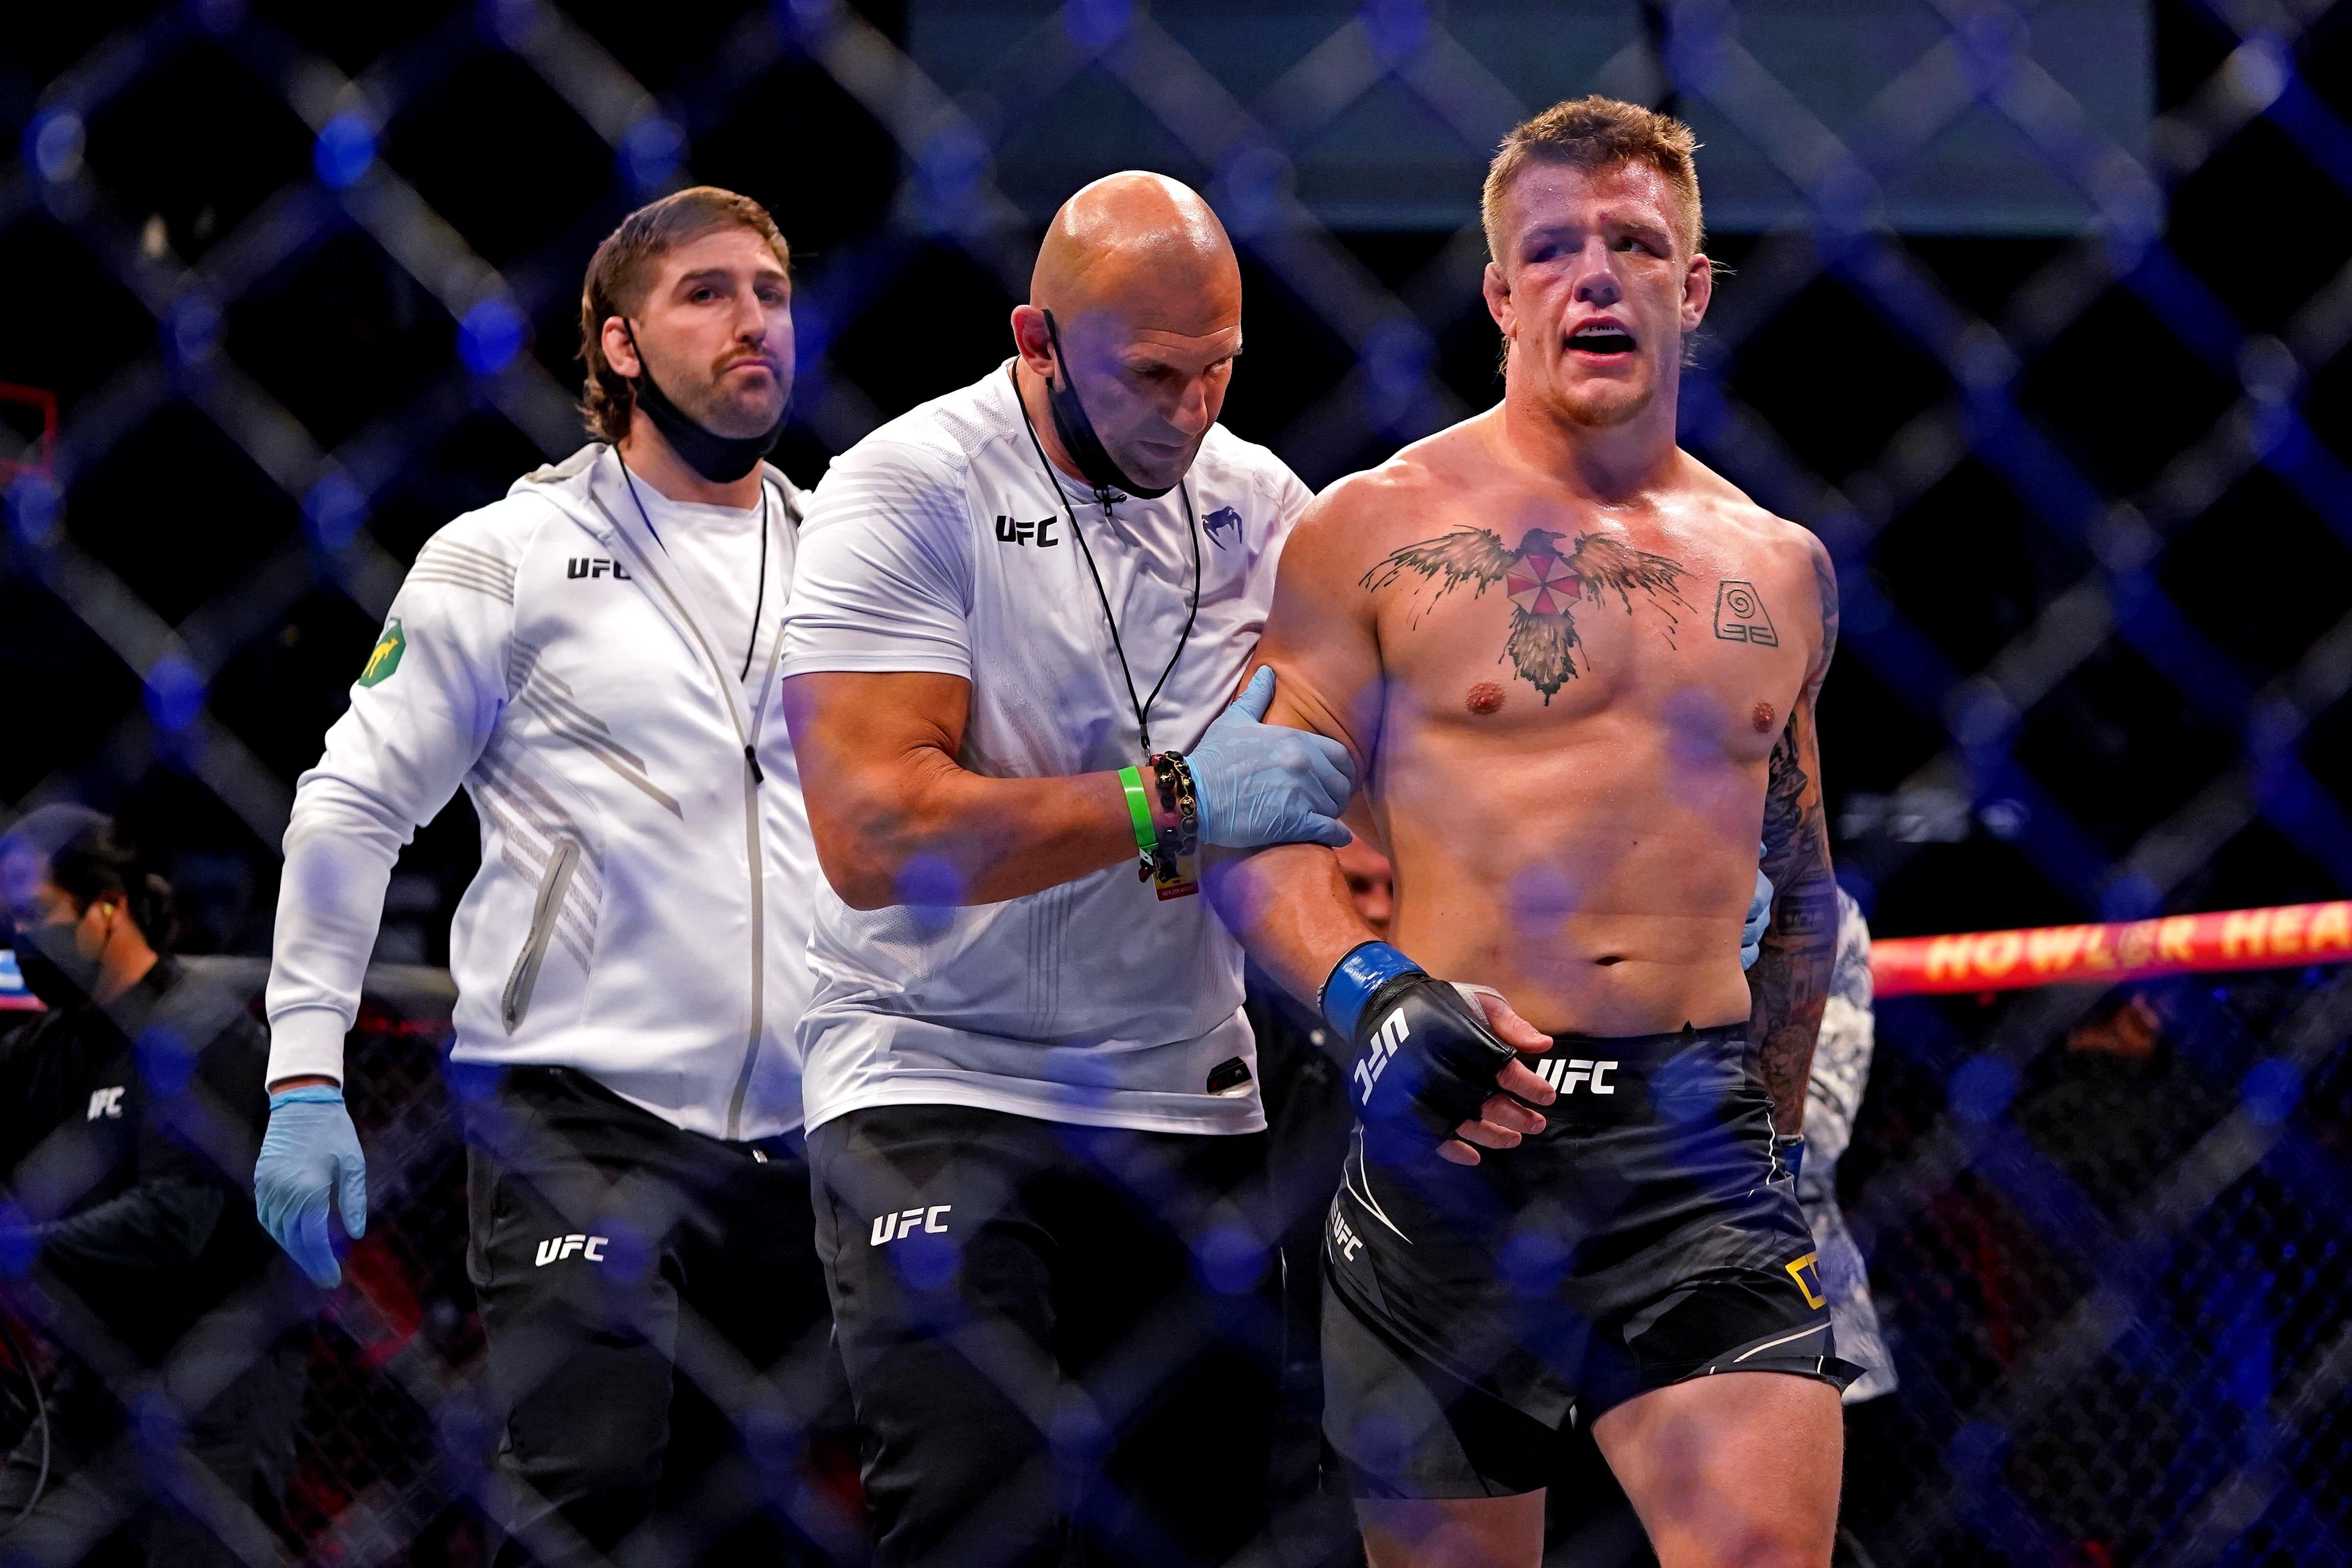 Best of UFC 261: Kamaru Usman vs. Jorge Masvidal 2